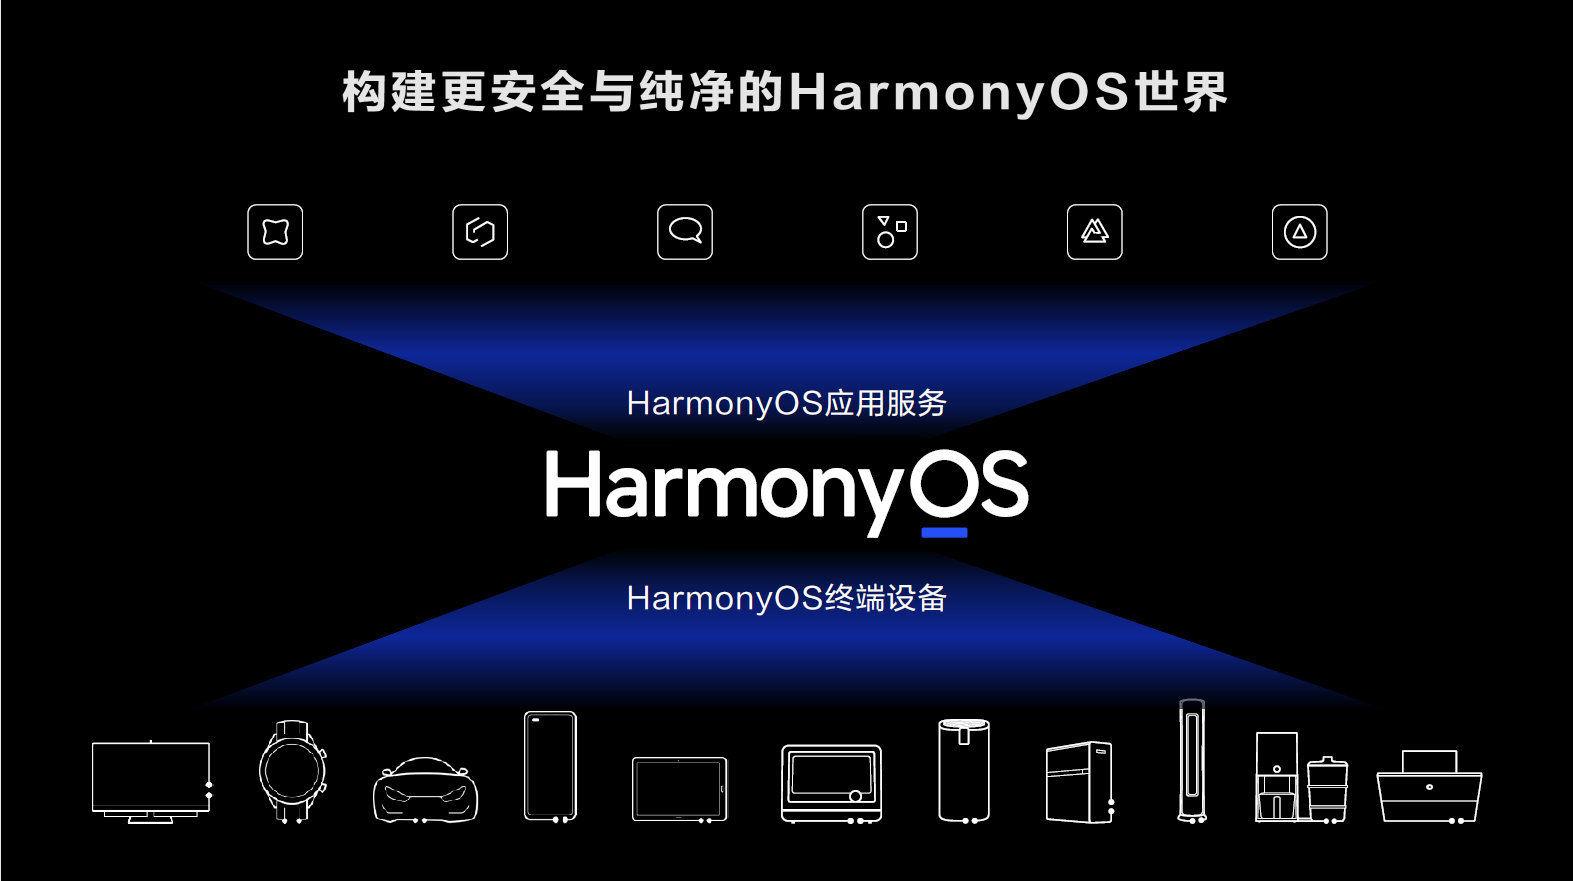 HarmonyOS是「为互联网时代打造的智能终端操作系统」 华为